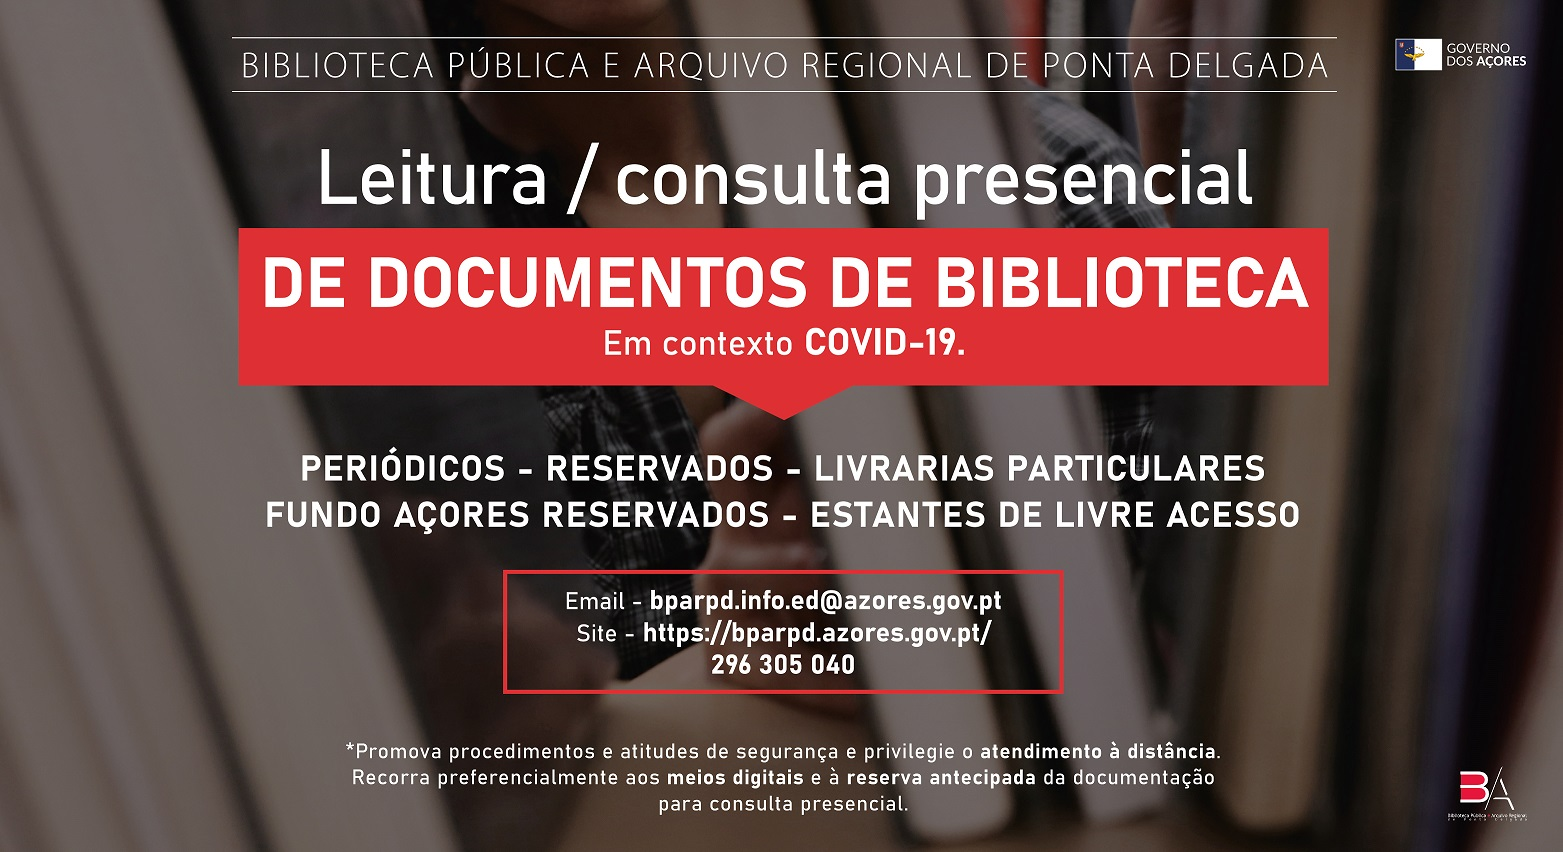 Leitura / Consulta presencial de documentos de biblioteca